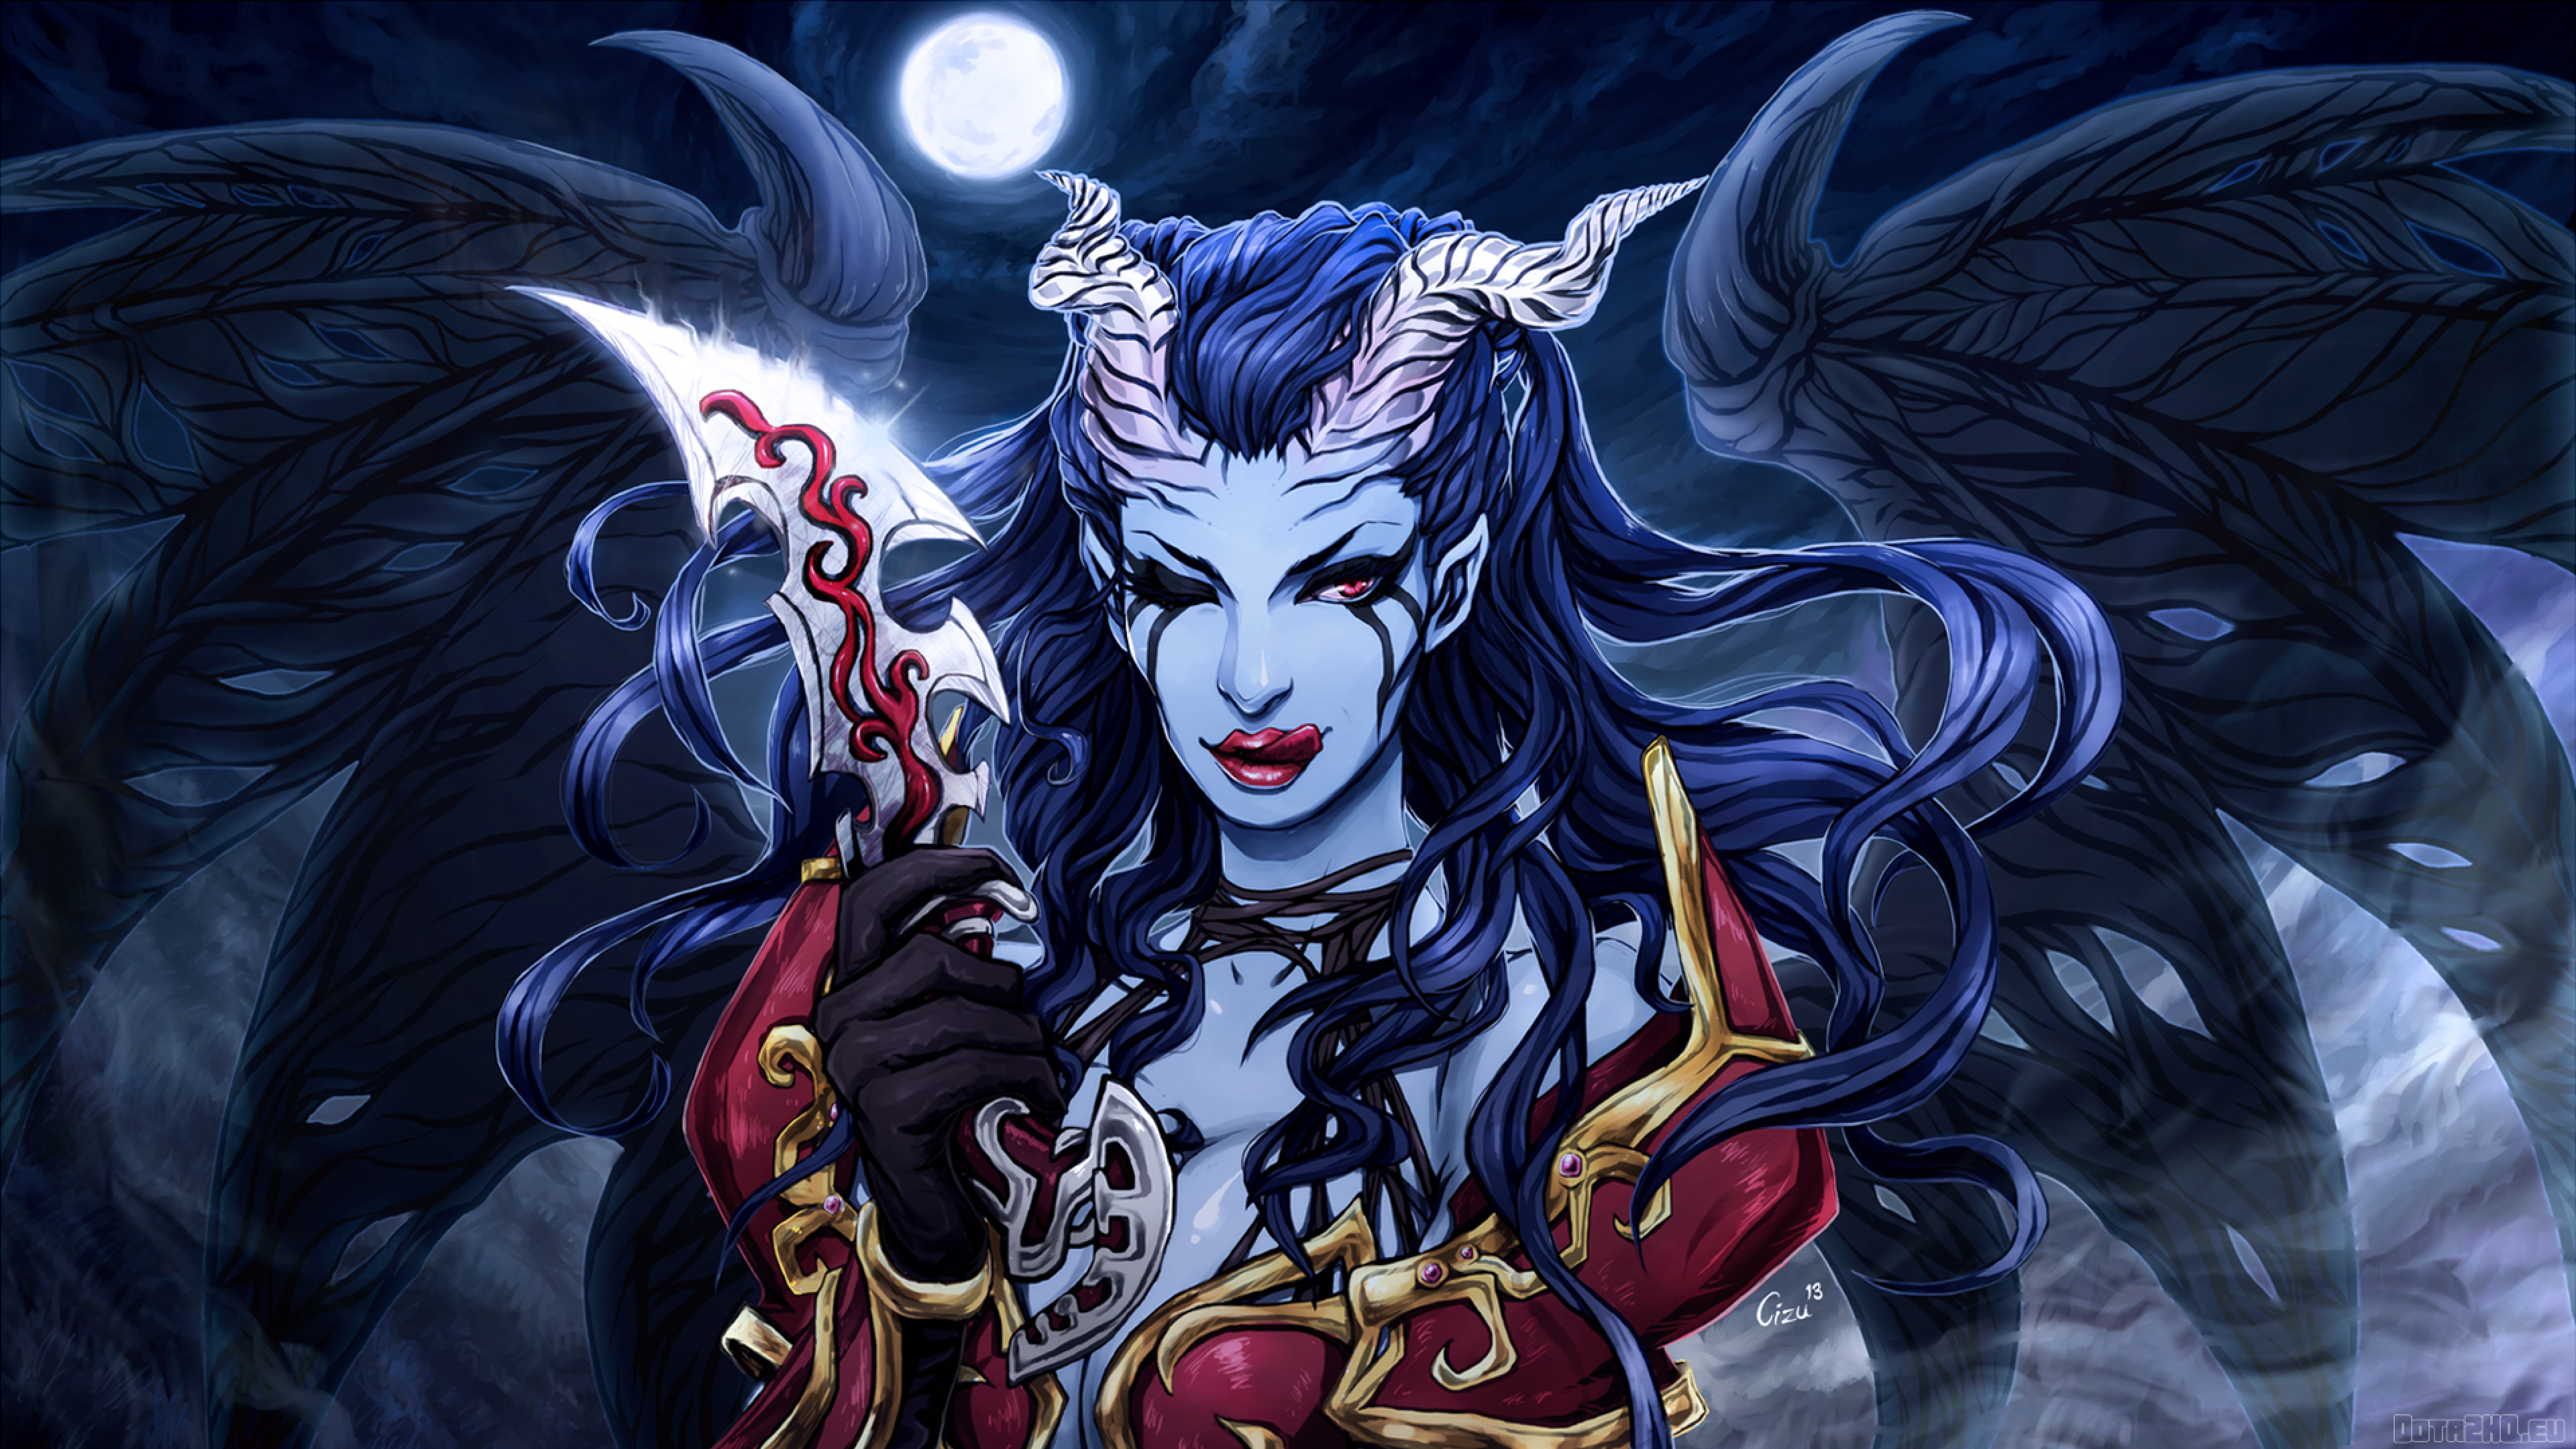 3840x2160 Akasha Queen Of Pain Dota 2 4k Wallpaper Hd Games 4k